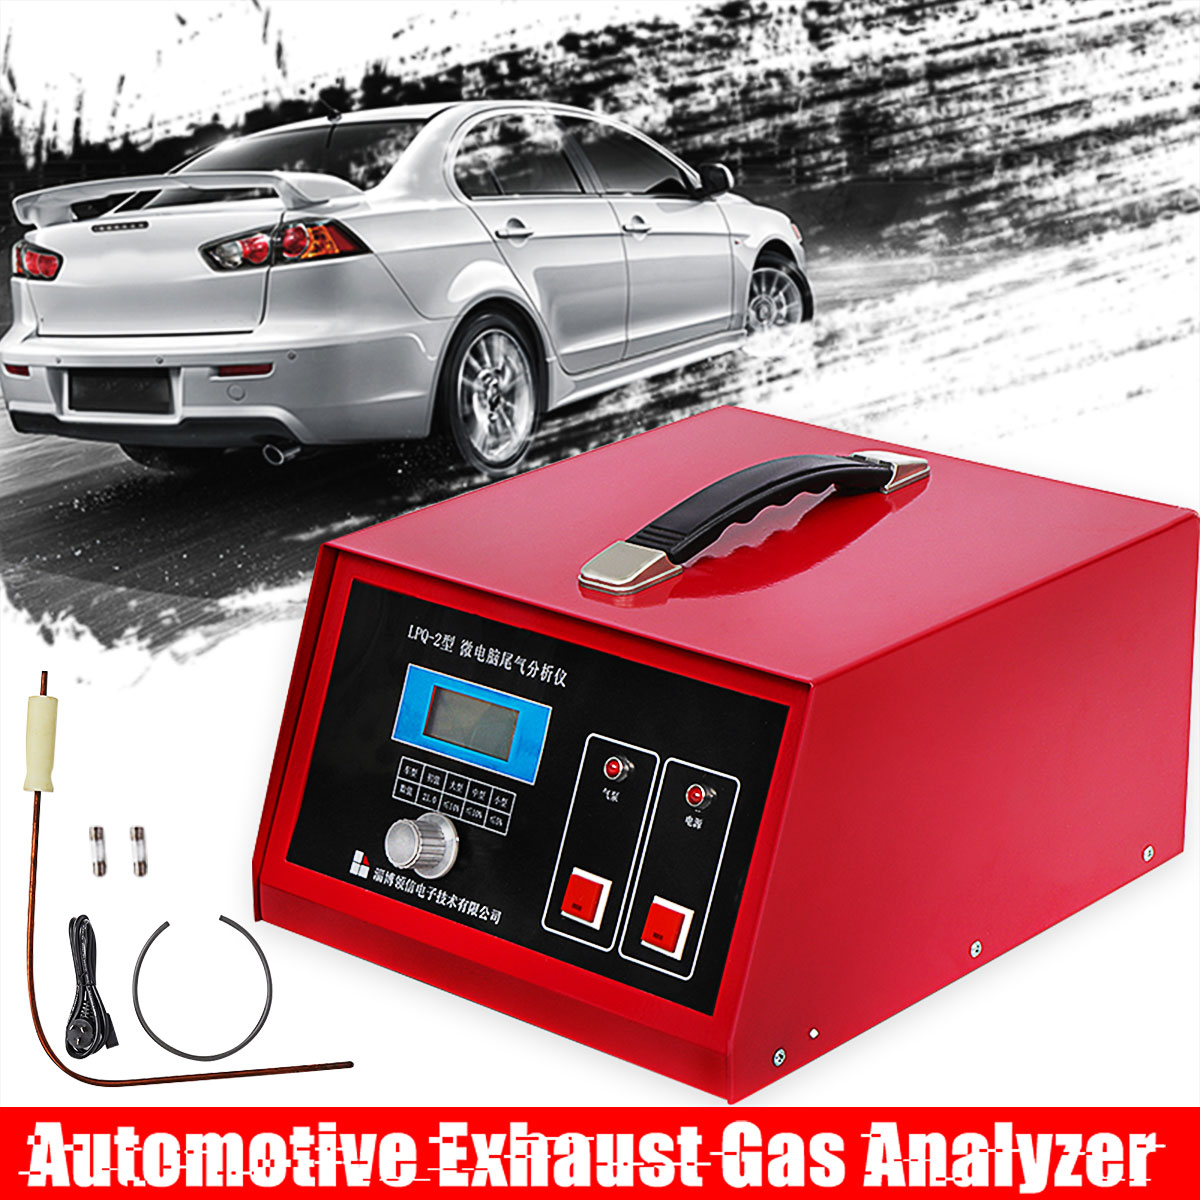 220V Pm2.5 Detector Automotive Vehicle Exhaust Gas Analyzer  Vehicle Emission Gas Analyzer Tail Gas Oxygen Conten Detector